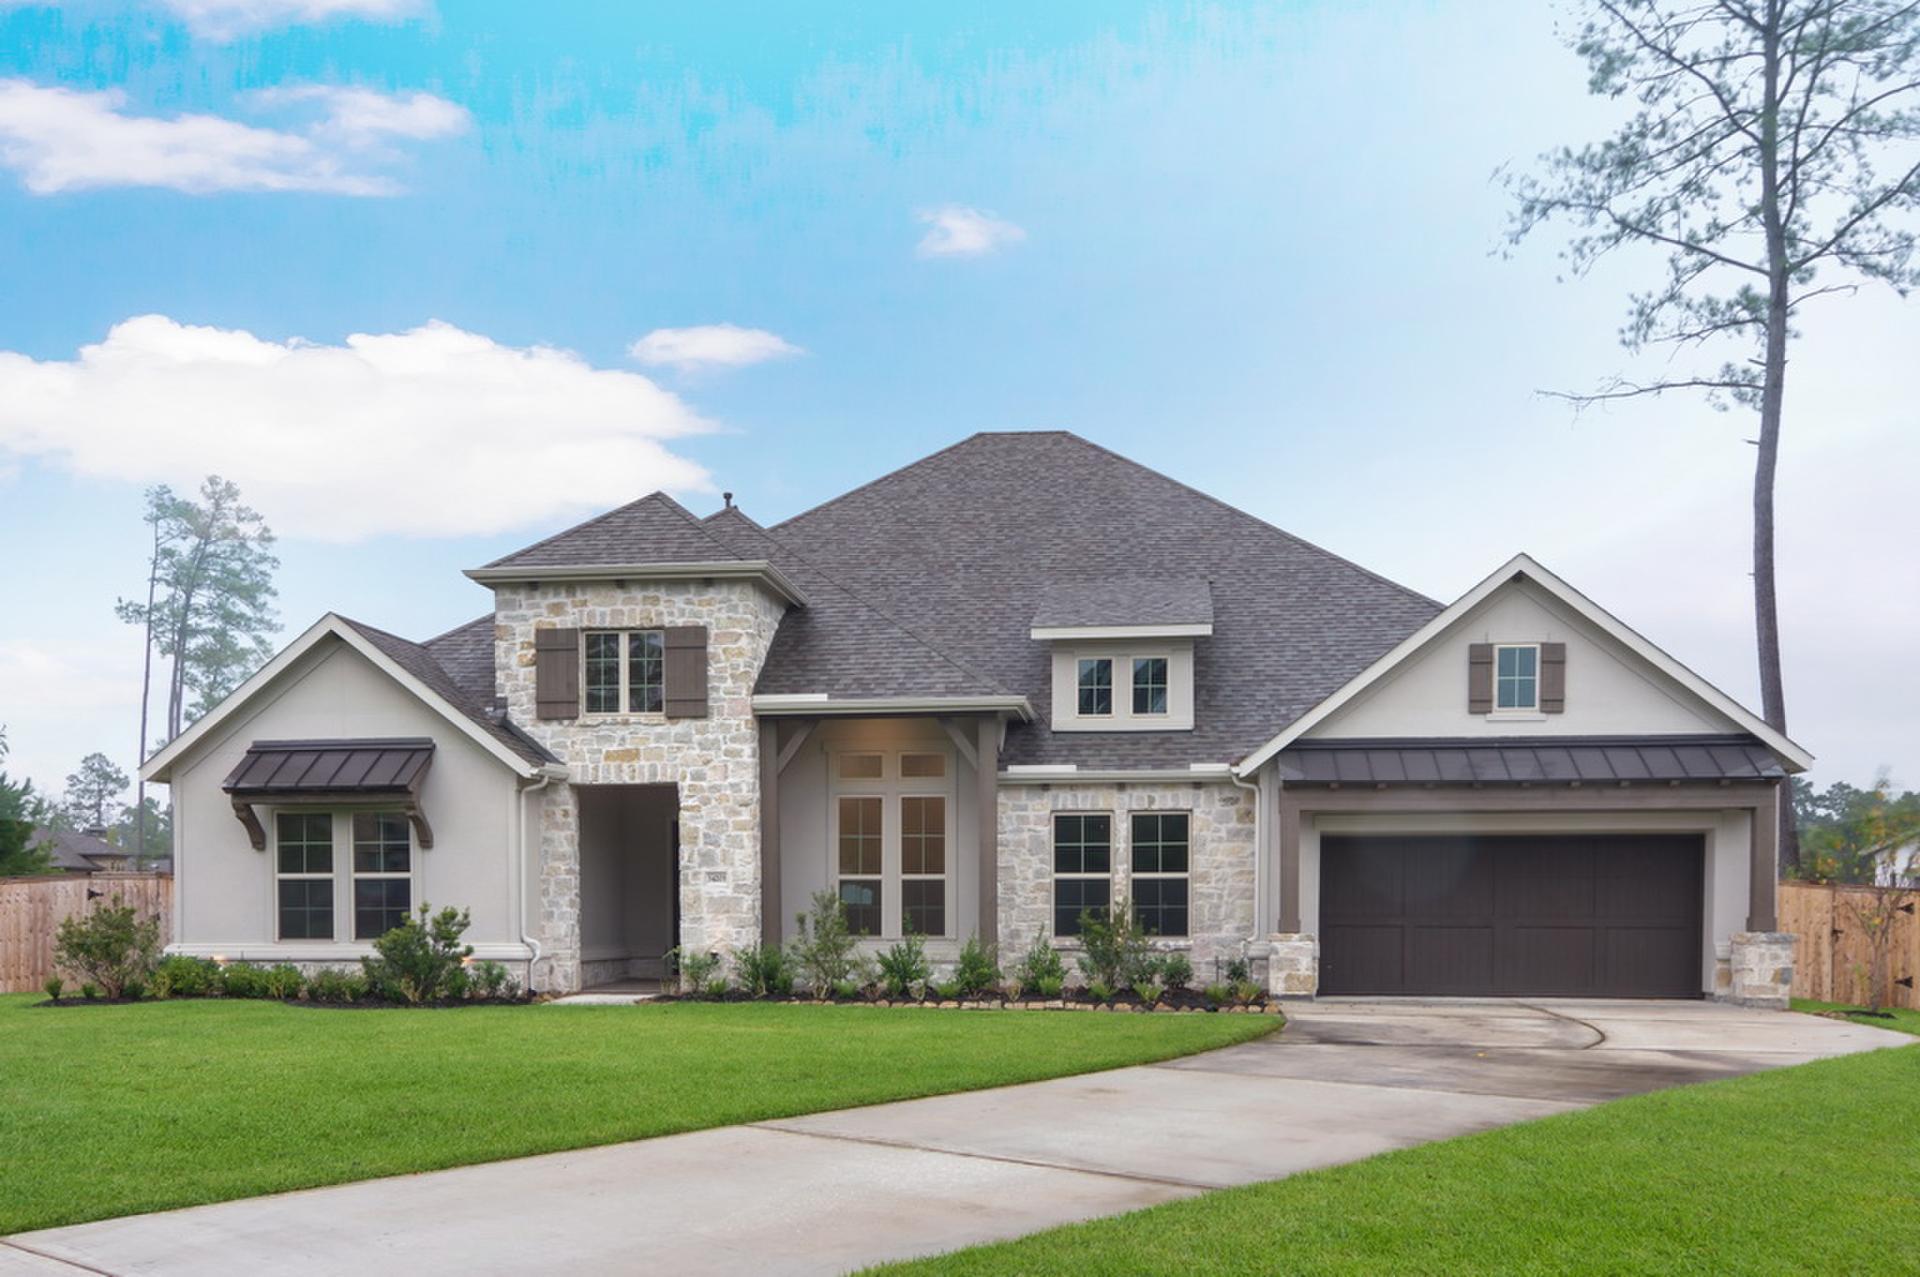 Single Family for Active at Castella 34203 Mill Creek Court Pinehurst, Texas 77362 United States